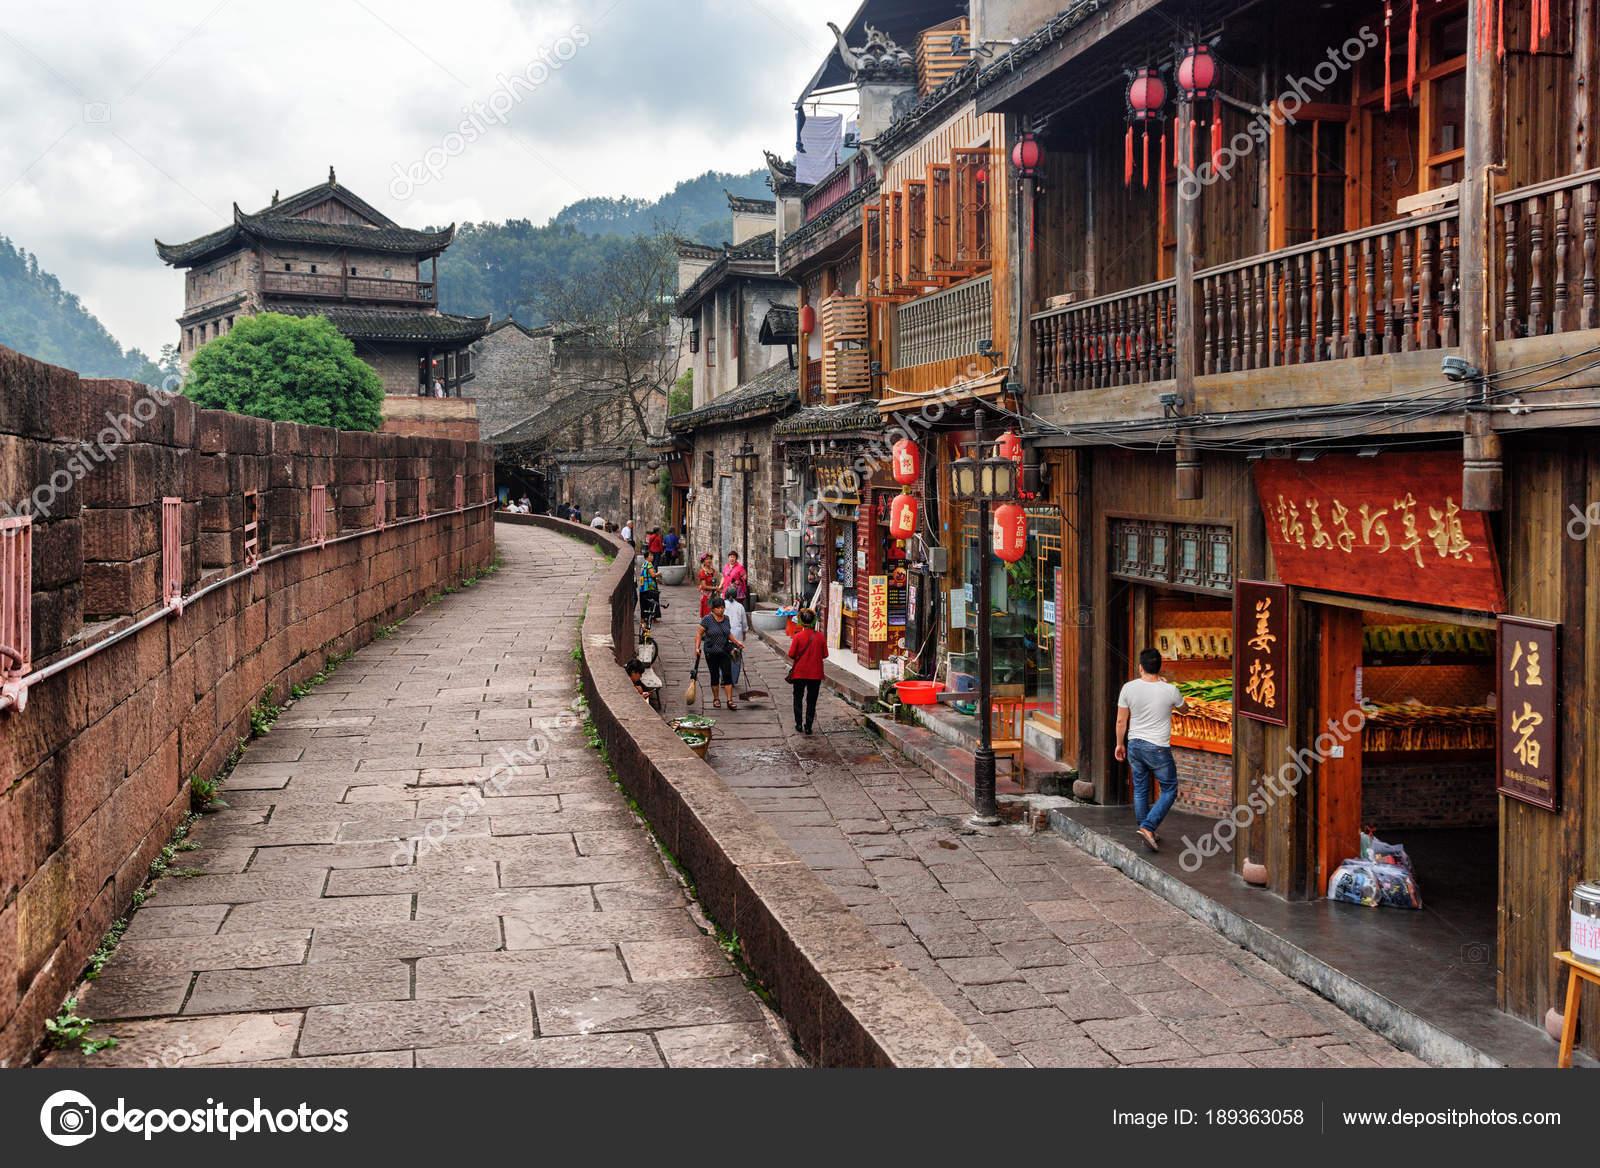 Street With Souvenir Shops And Restaurants Phoenix Ancient